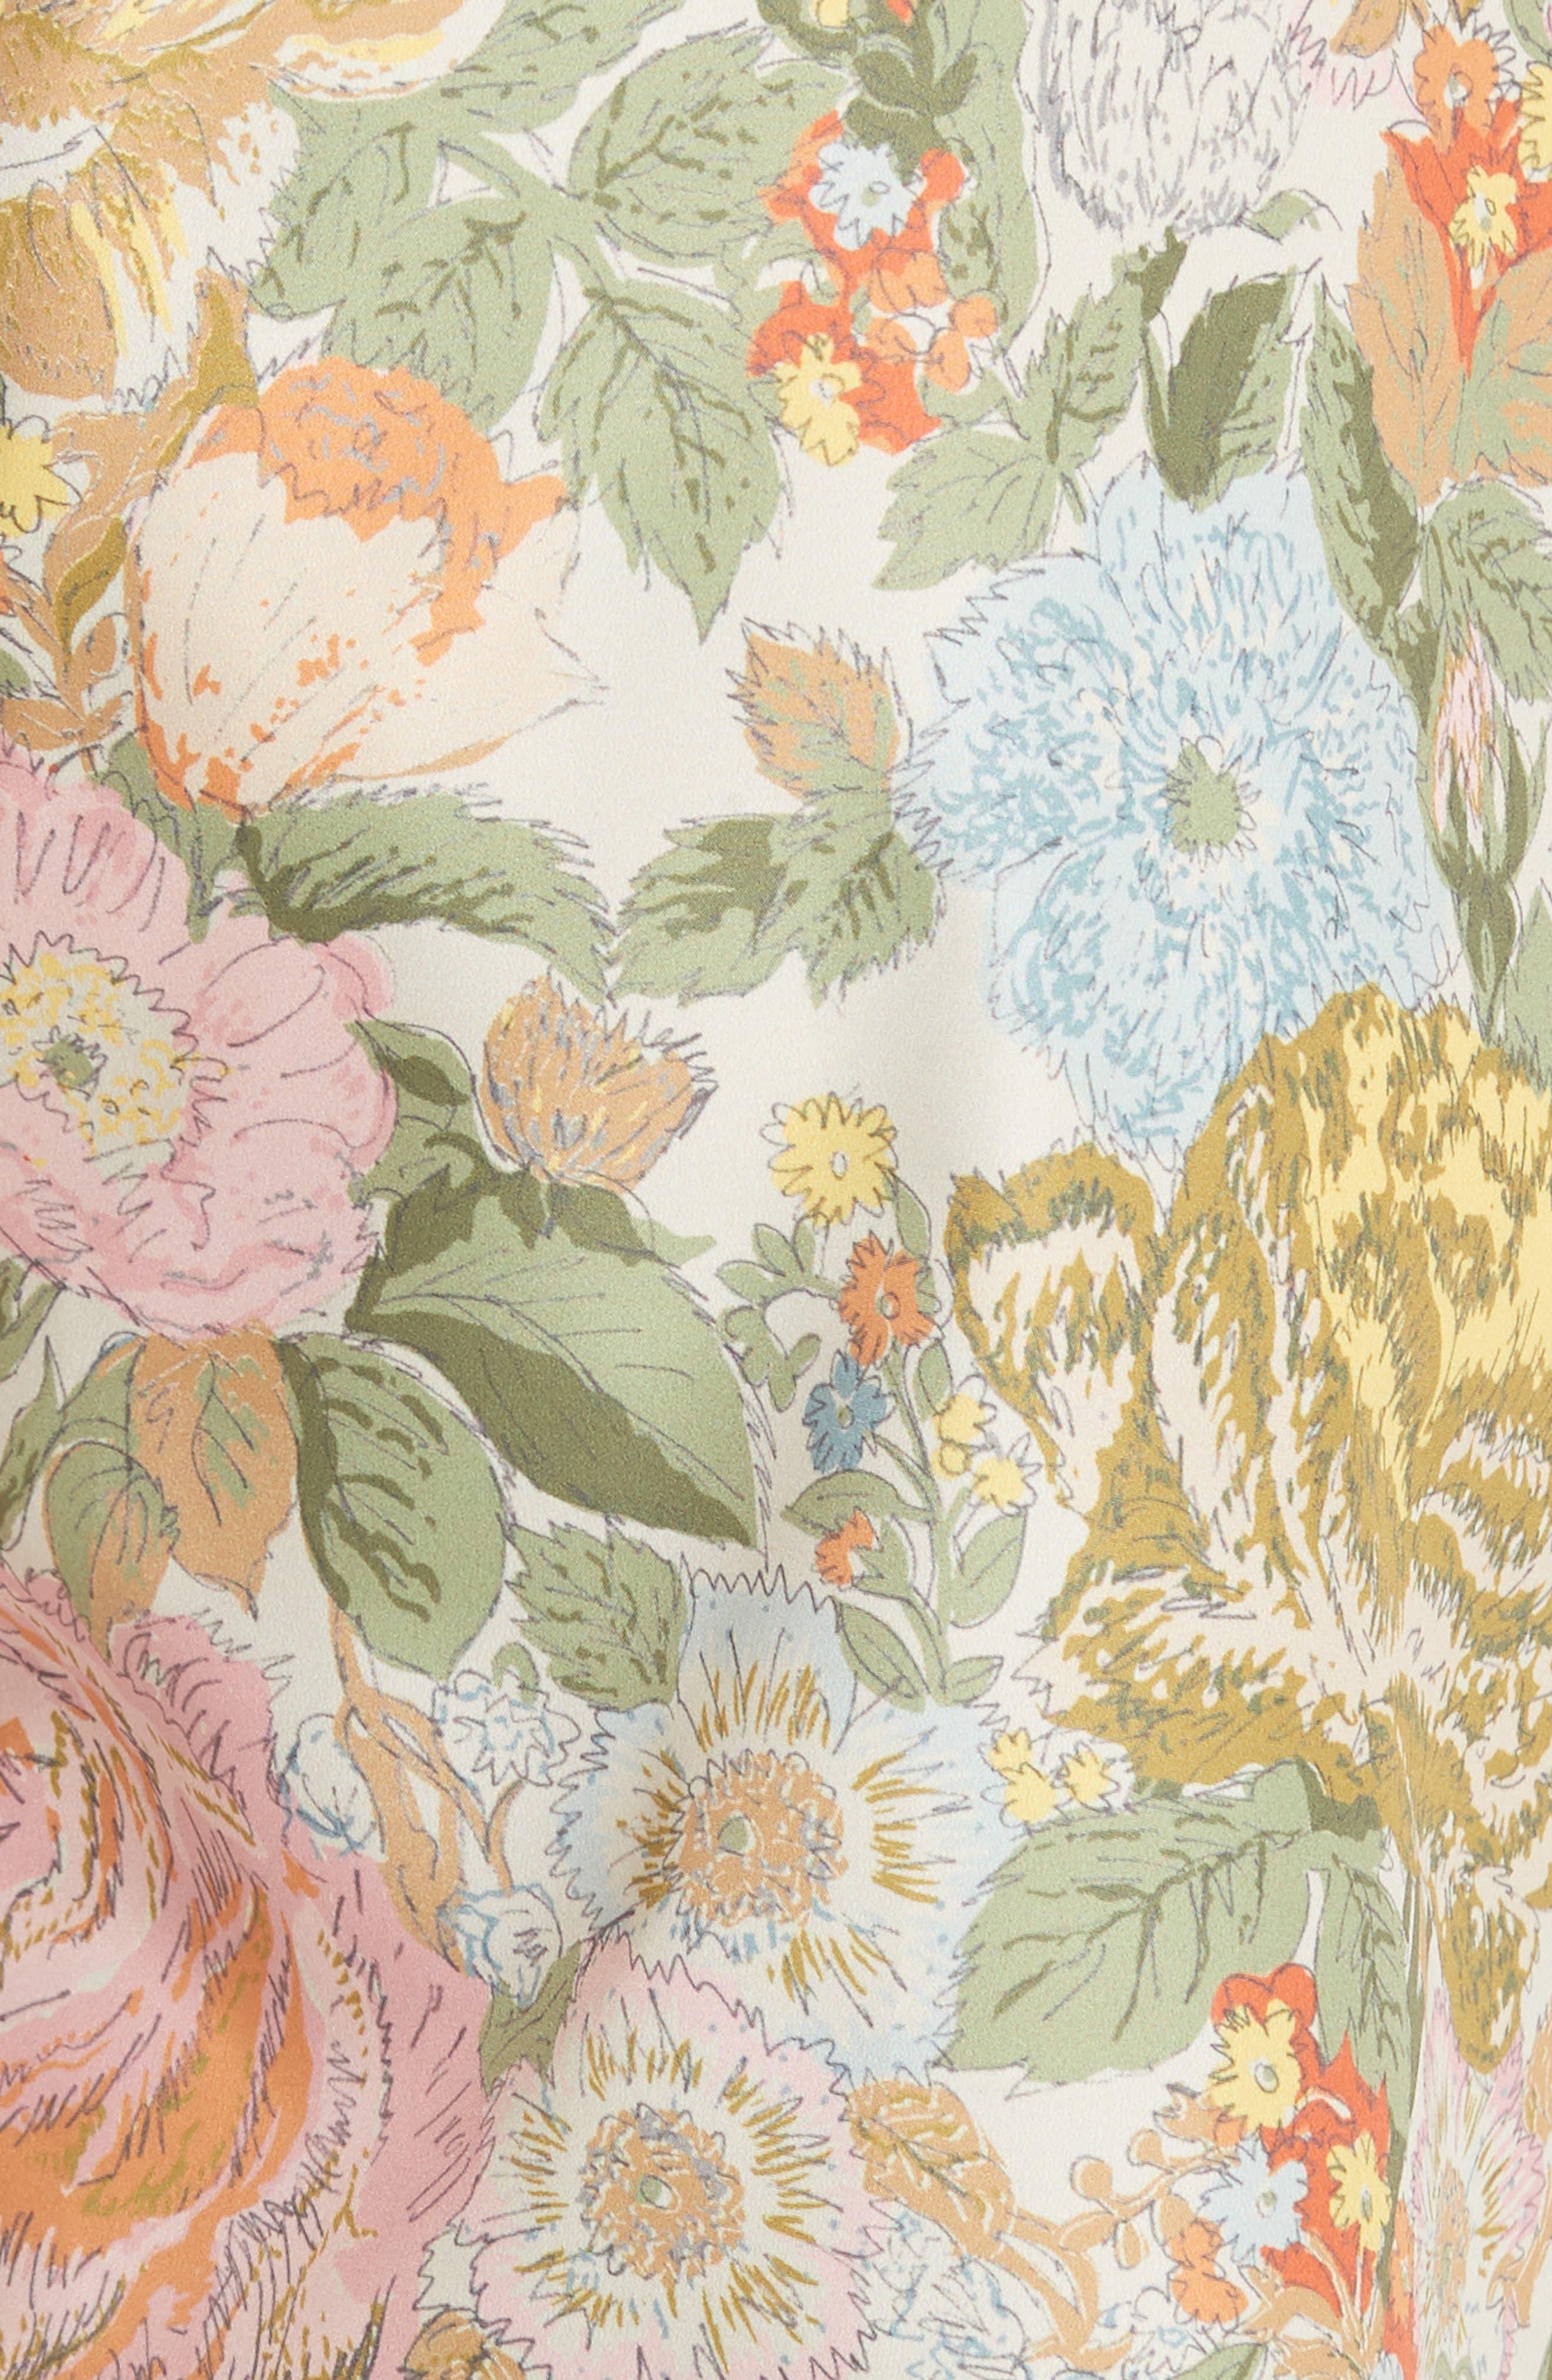 Guildes Floral Print Swim Trunks,                             Alternate thumbnail 5, color,                             800